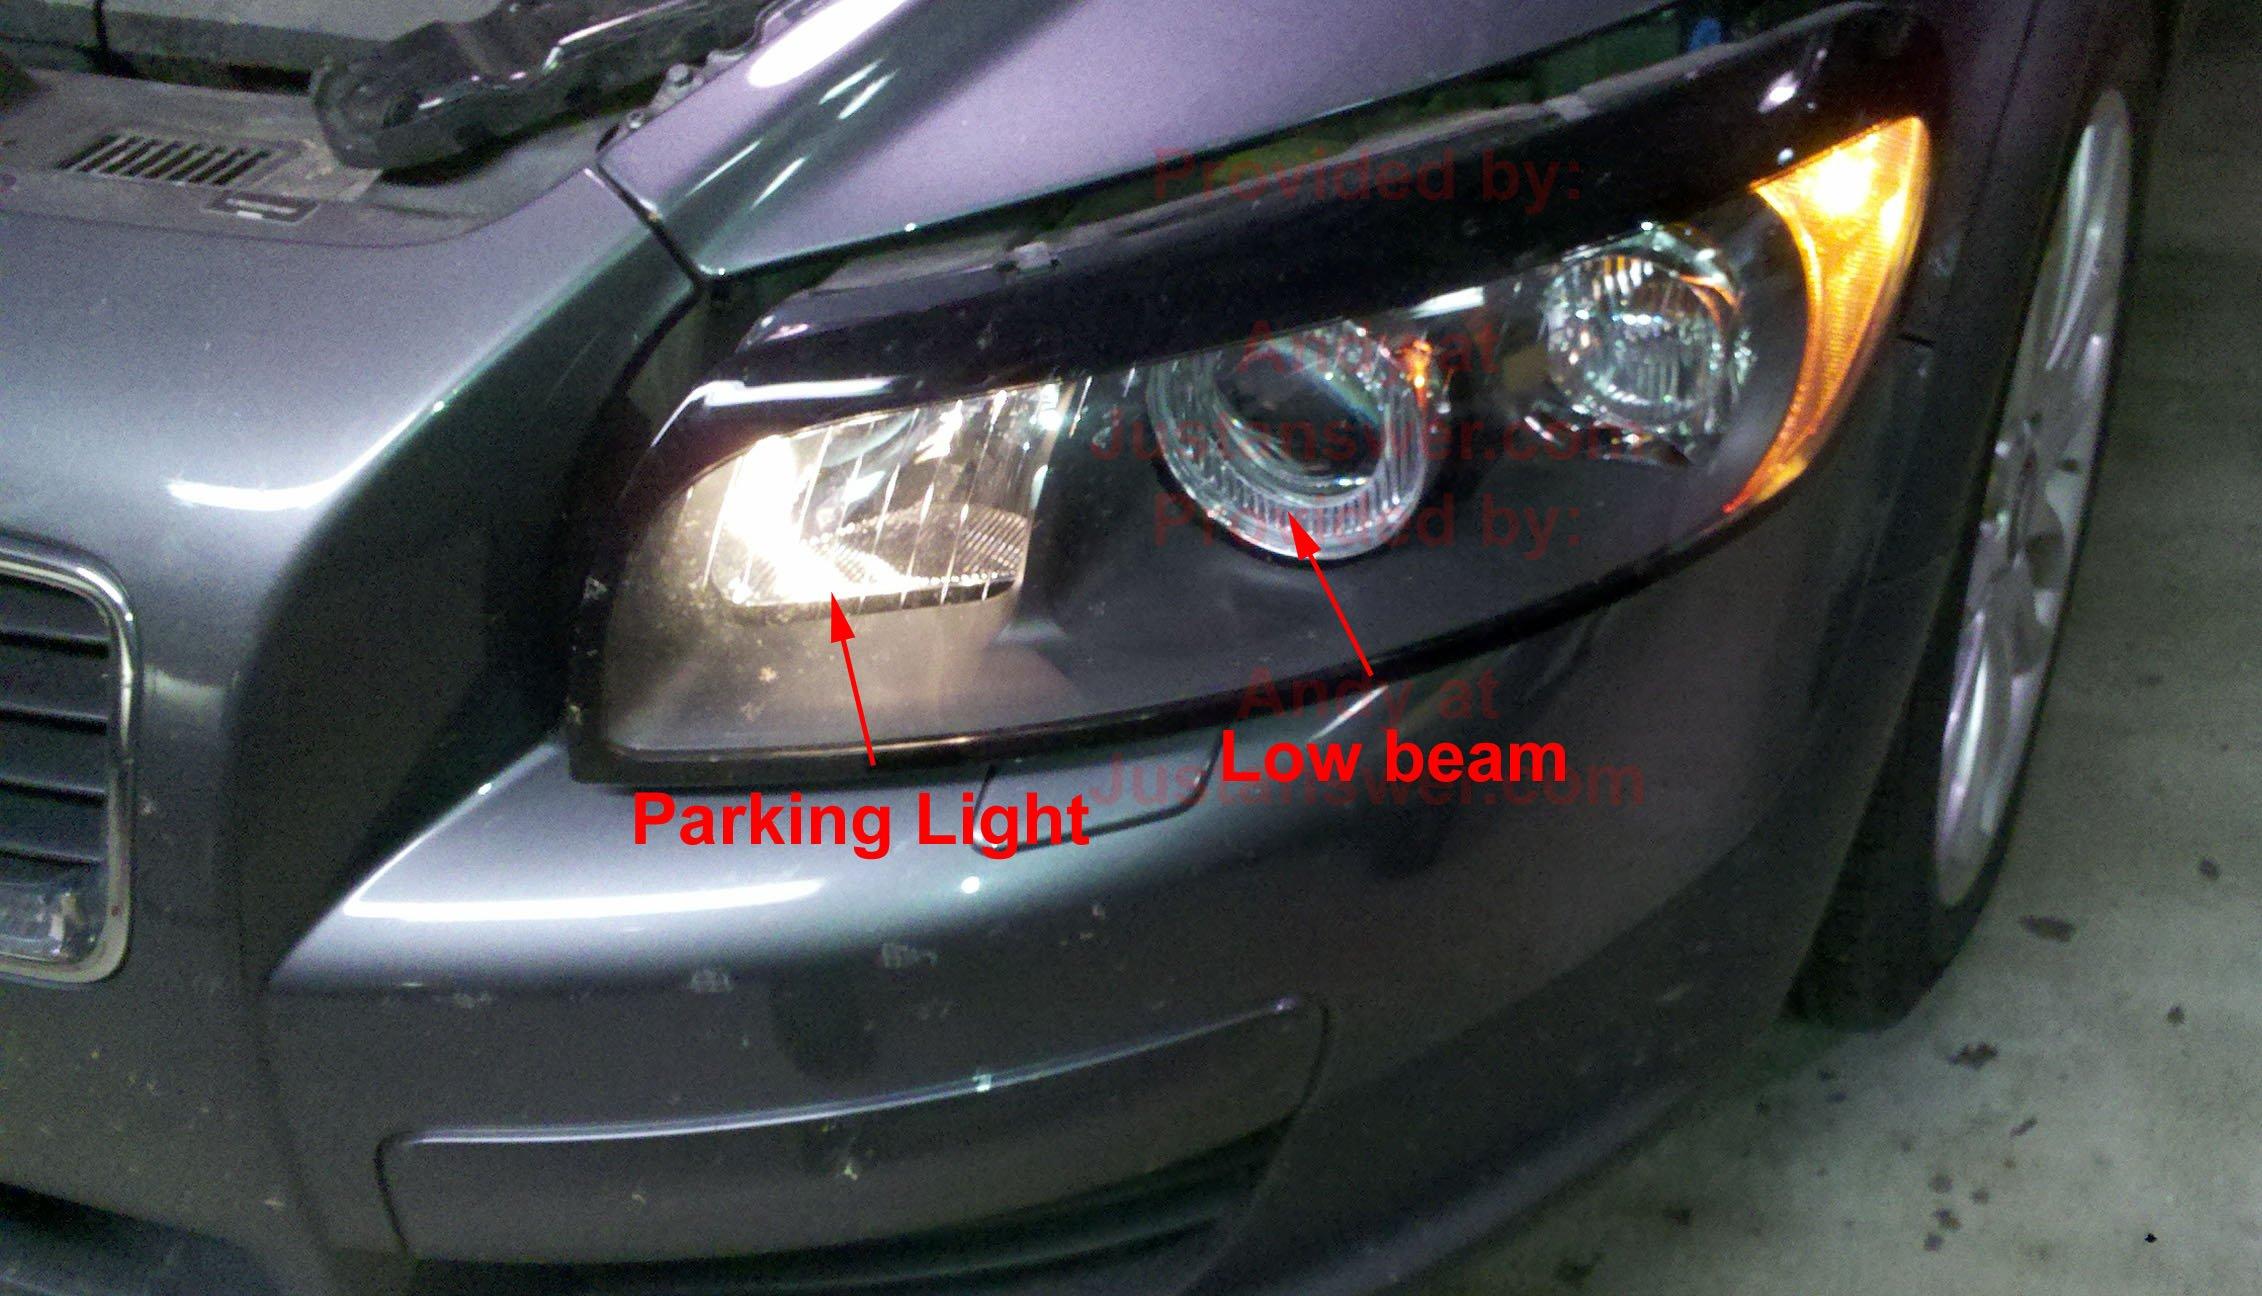 My Volvo S Headlights Are Very Dim Any Ideas